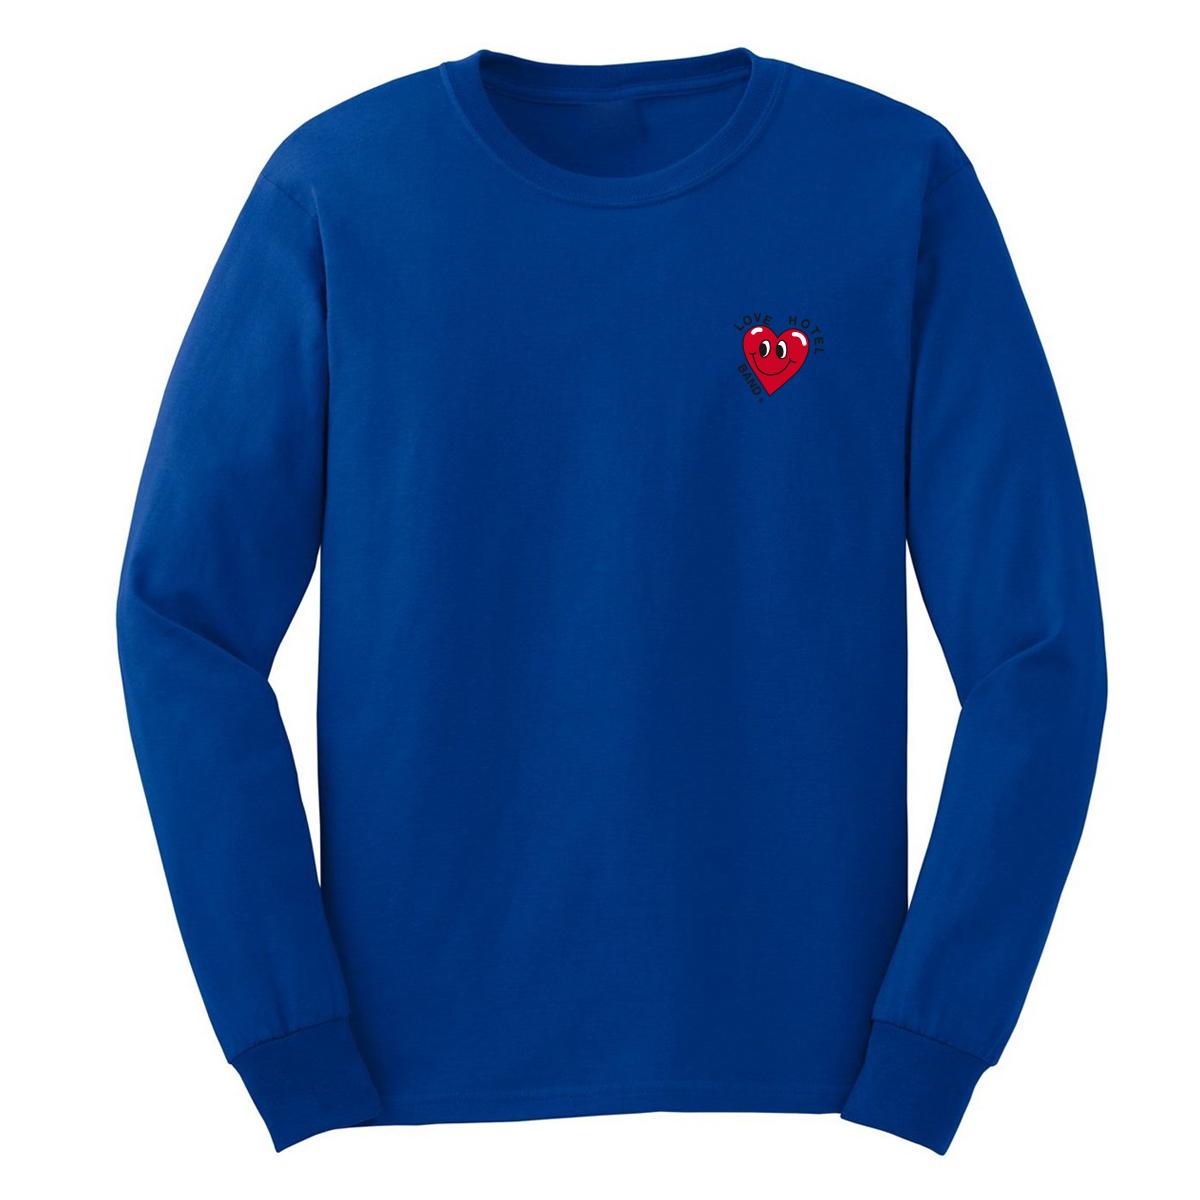 Love Hotel Band Herz Longsleeve Longsleeve, Blue